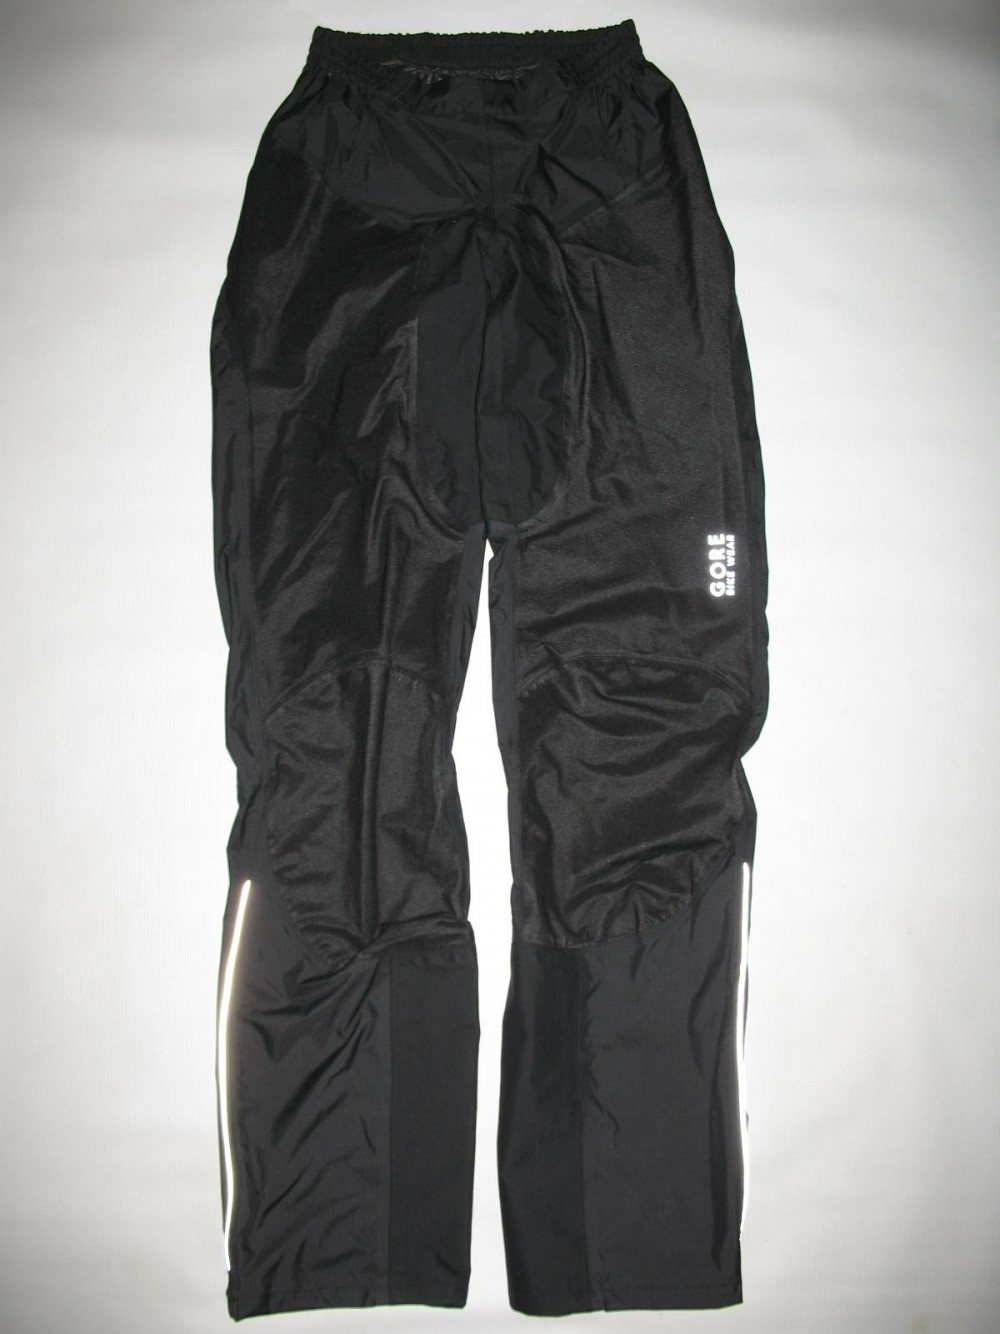 Штаны GORE gtx bike pants lady (размер 34/XS) - 1